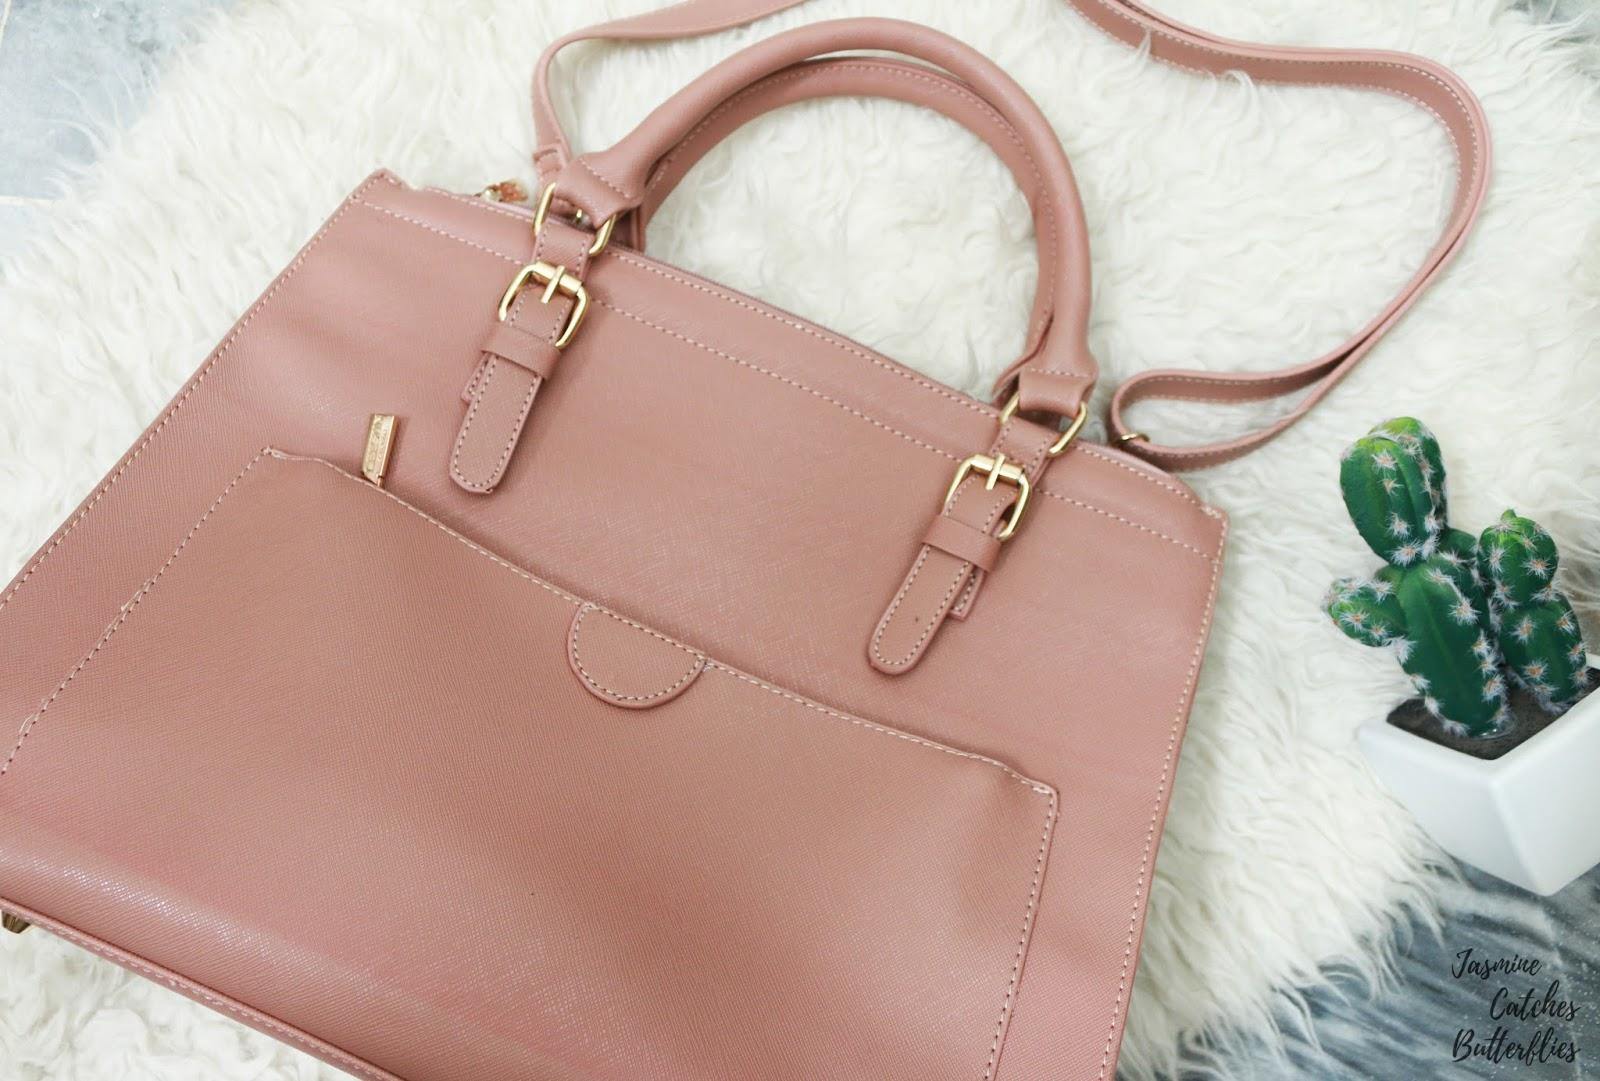 0c1ae6dfe72 Silk Avenue Handbag and Shopping Experience Review